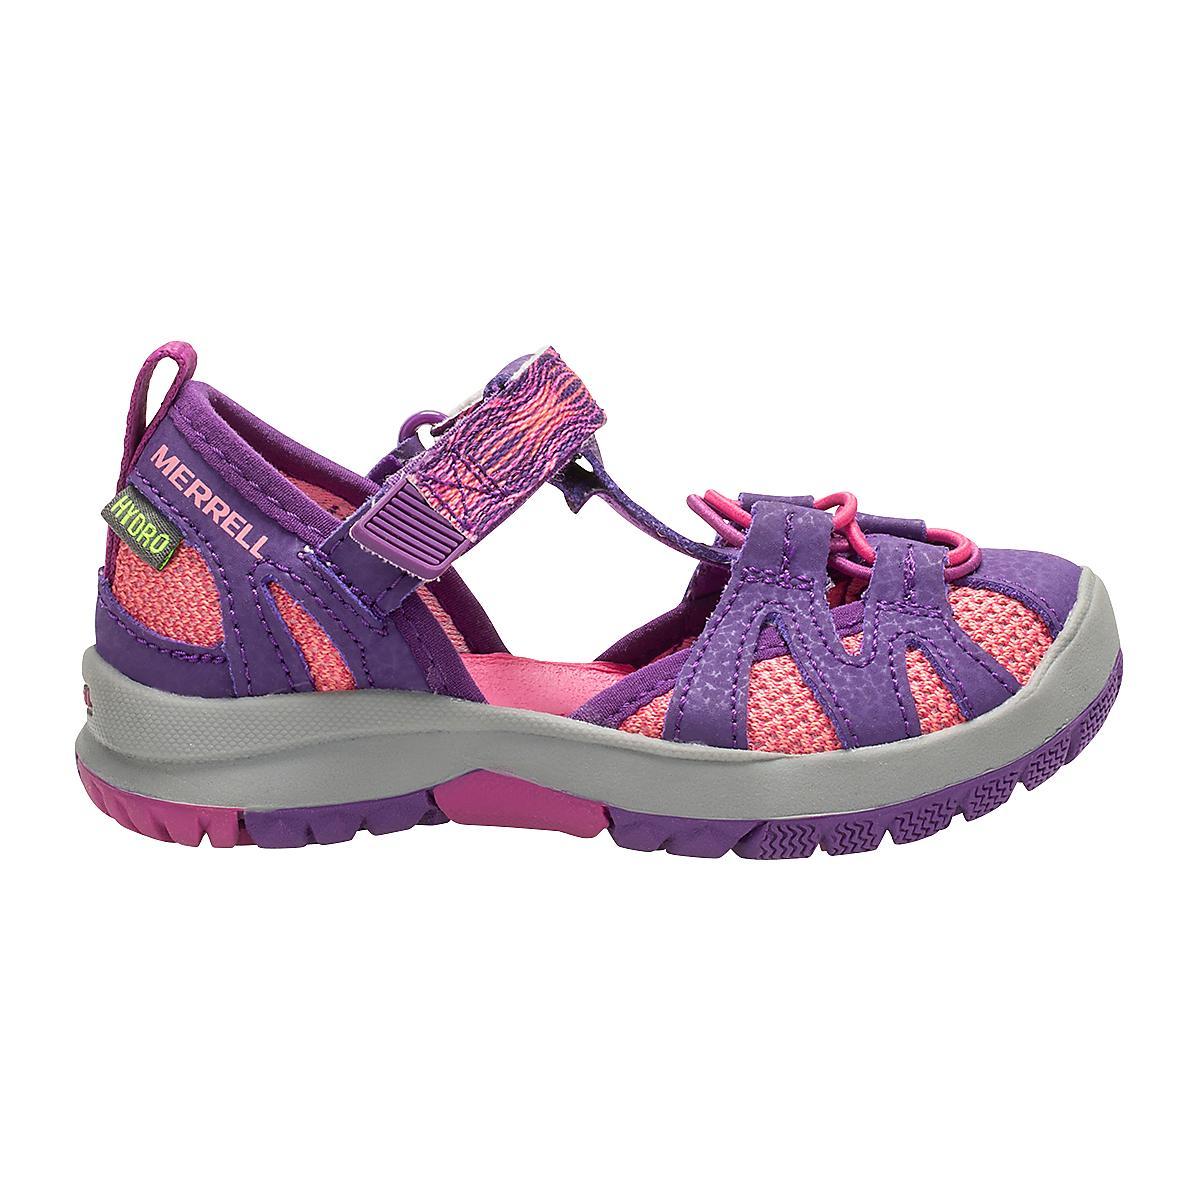 a11b2119cfd3 Kids Merrell Hydro Monarch Jr. 2.0 Sandals Shoe